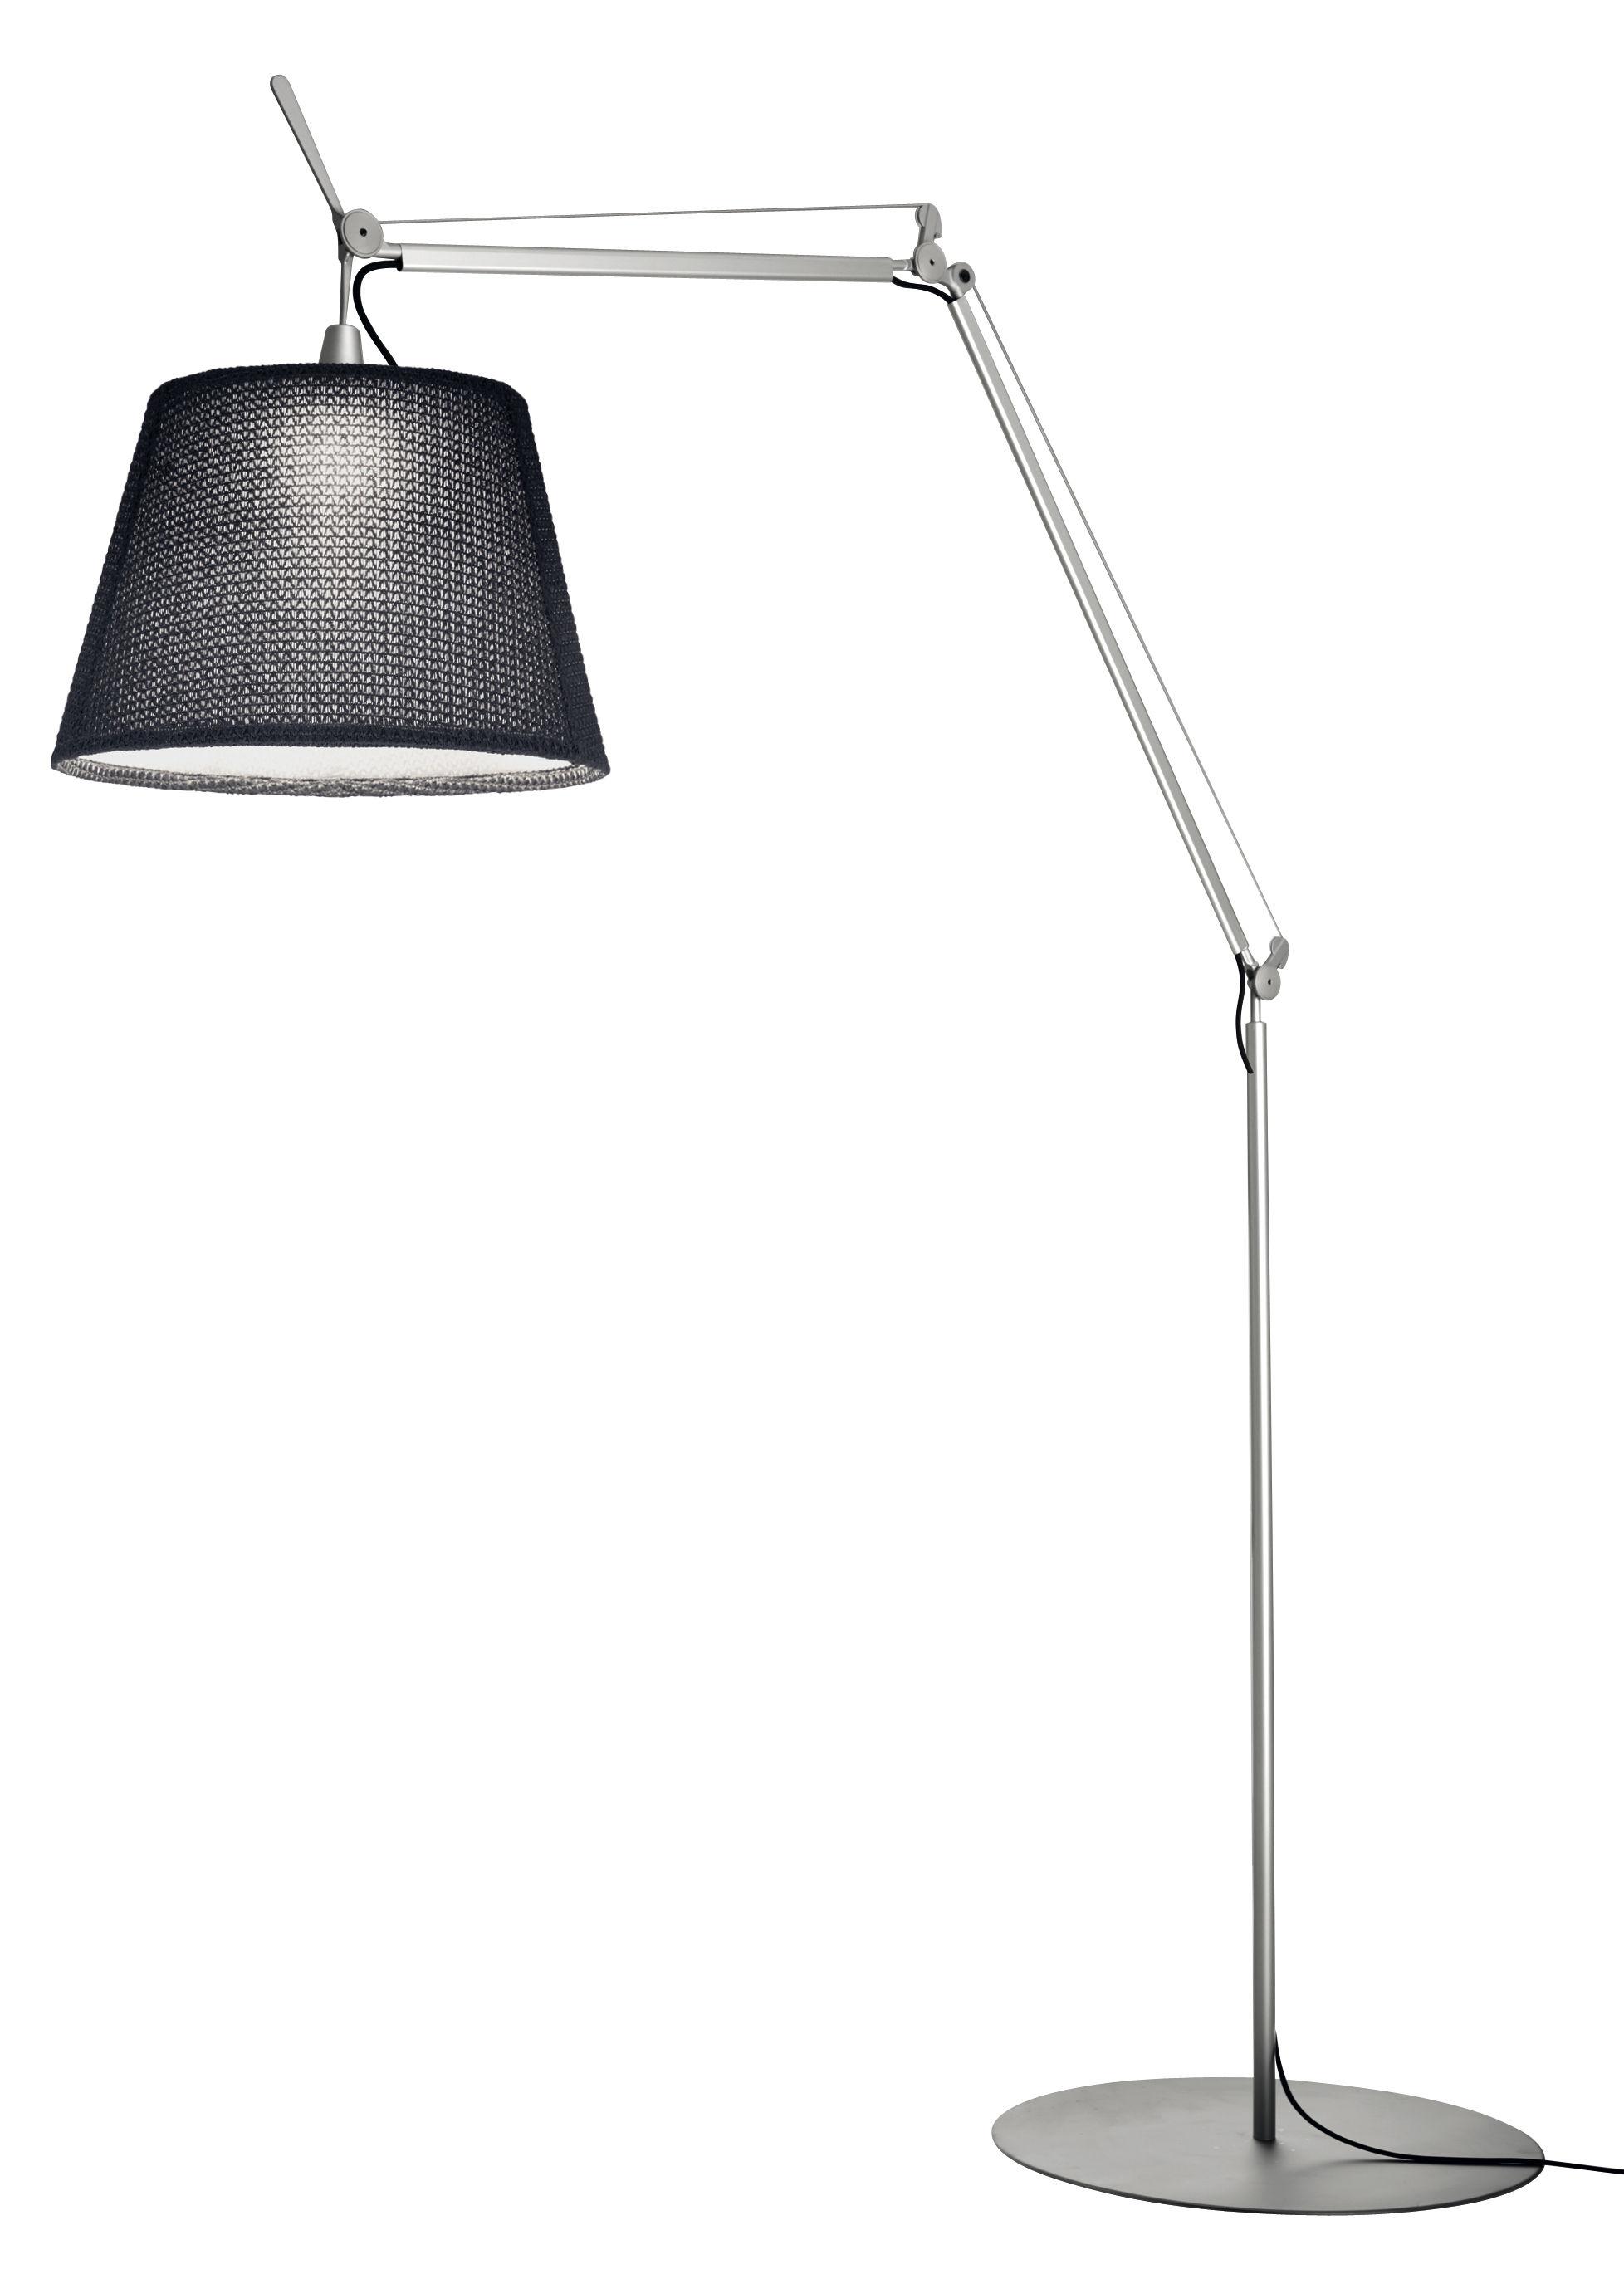 tolomeo paralume stehleuchte outdoorgeeignet led h 132 bis 298 cm grau by artemide made. Black Bedroom Furniture Sets. Home Design Ideas